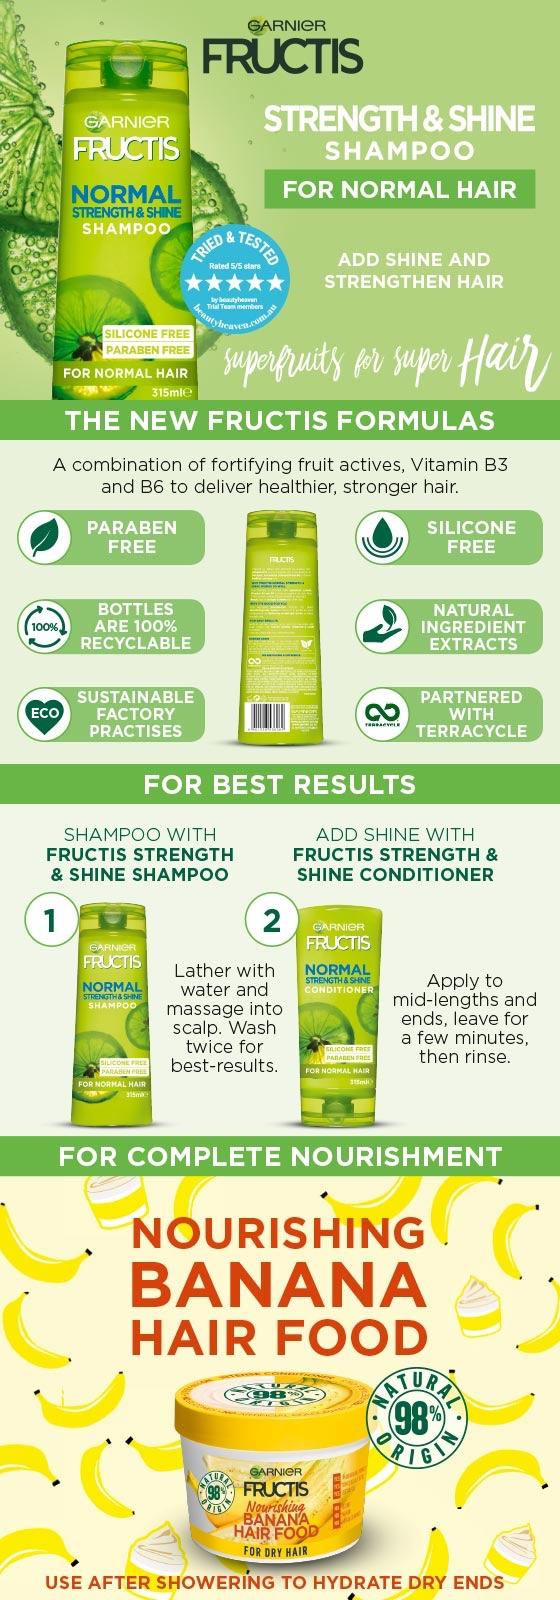 Garnier Fructis Normal Strength & Shine Shampoo 315ml